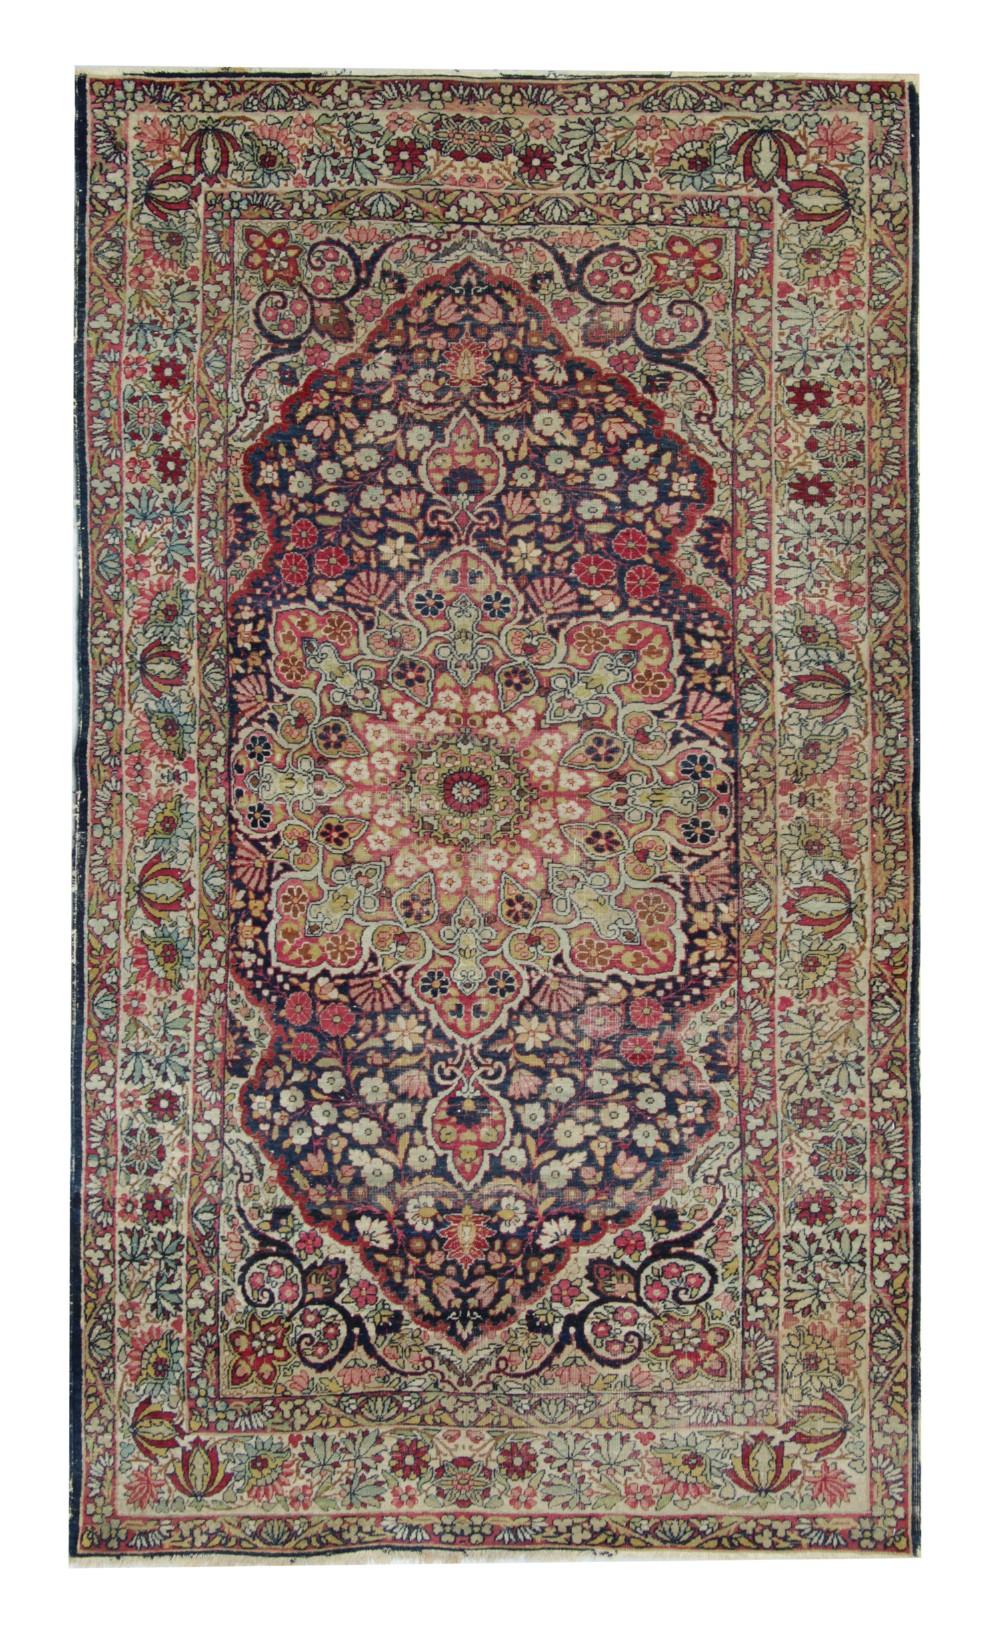 antique carpet persian rug medallion handwoven oriental wool rug 126x230cm